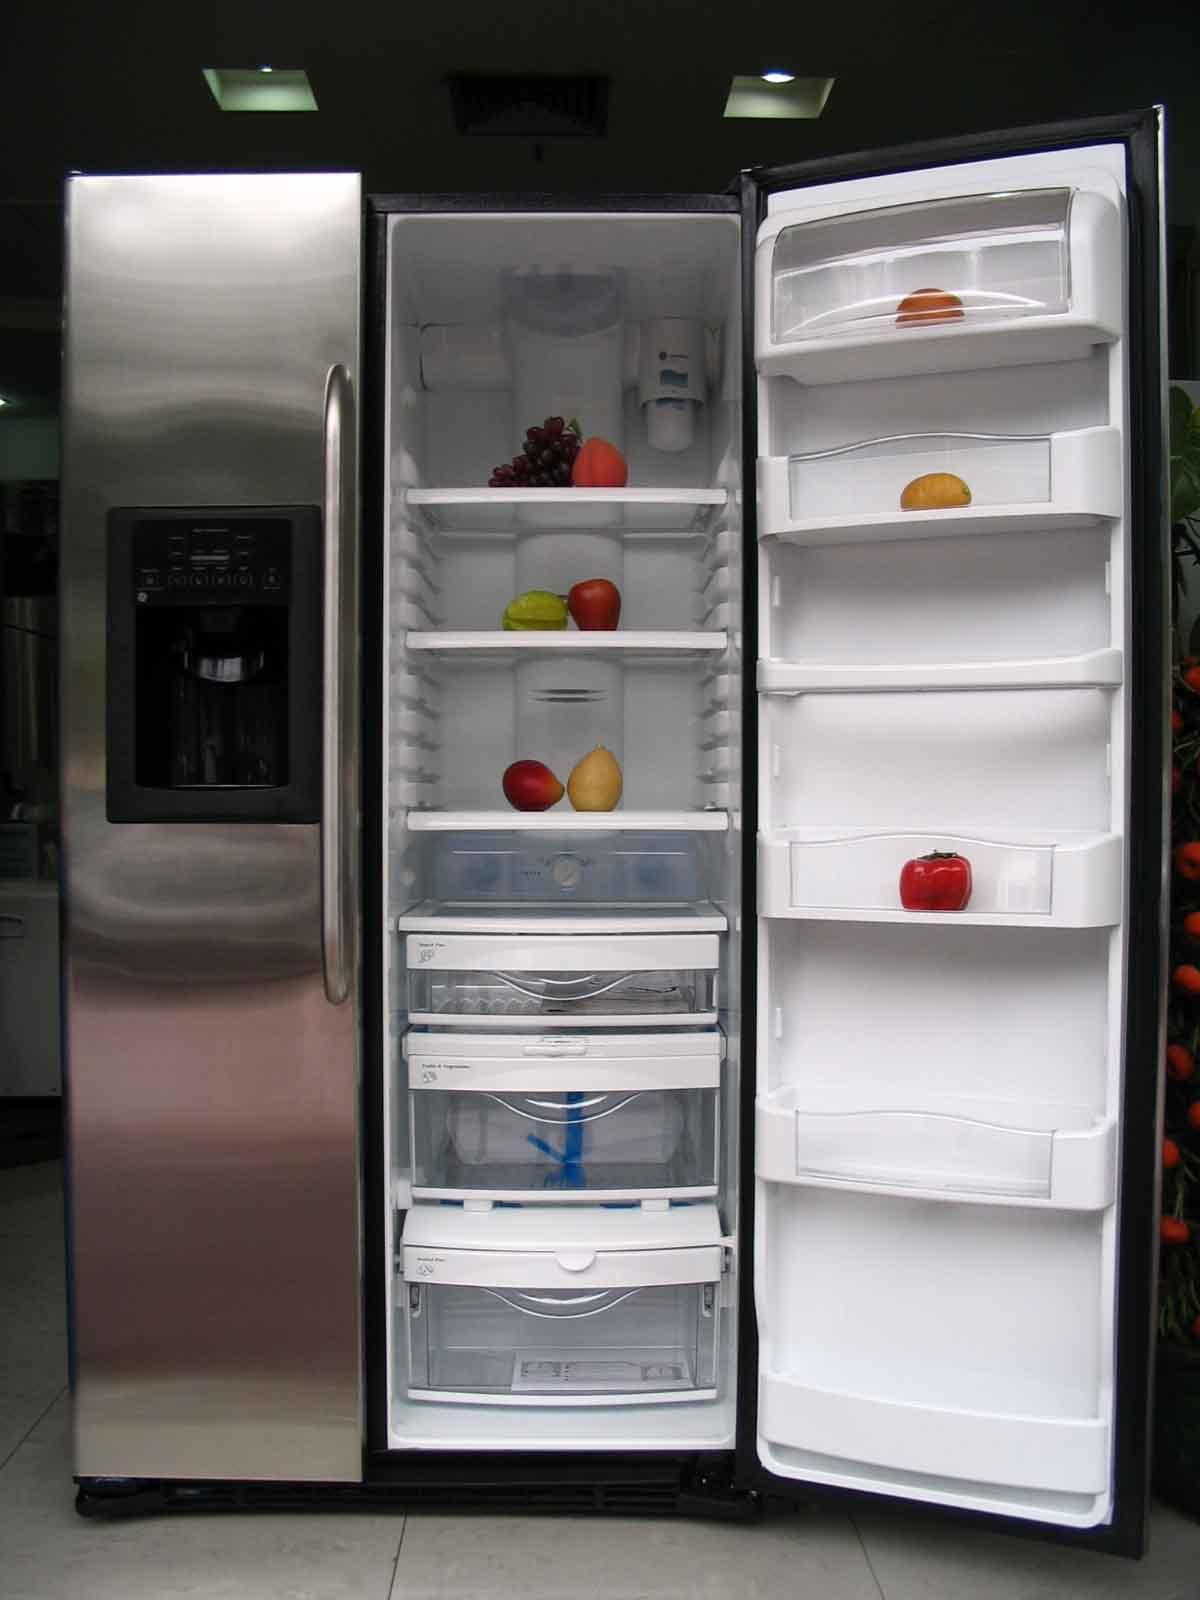 ge美国通用电冰箱 gce21mgtfss